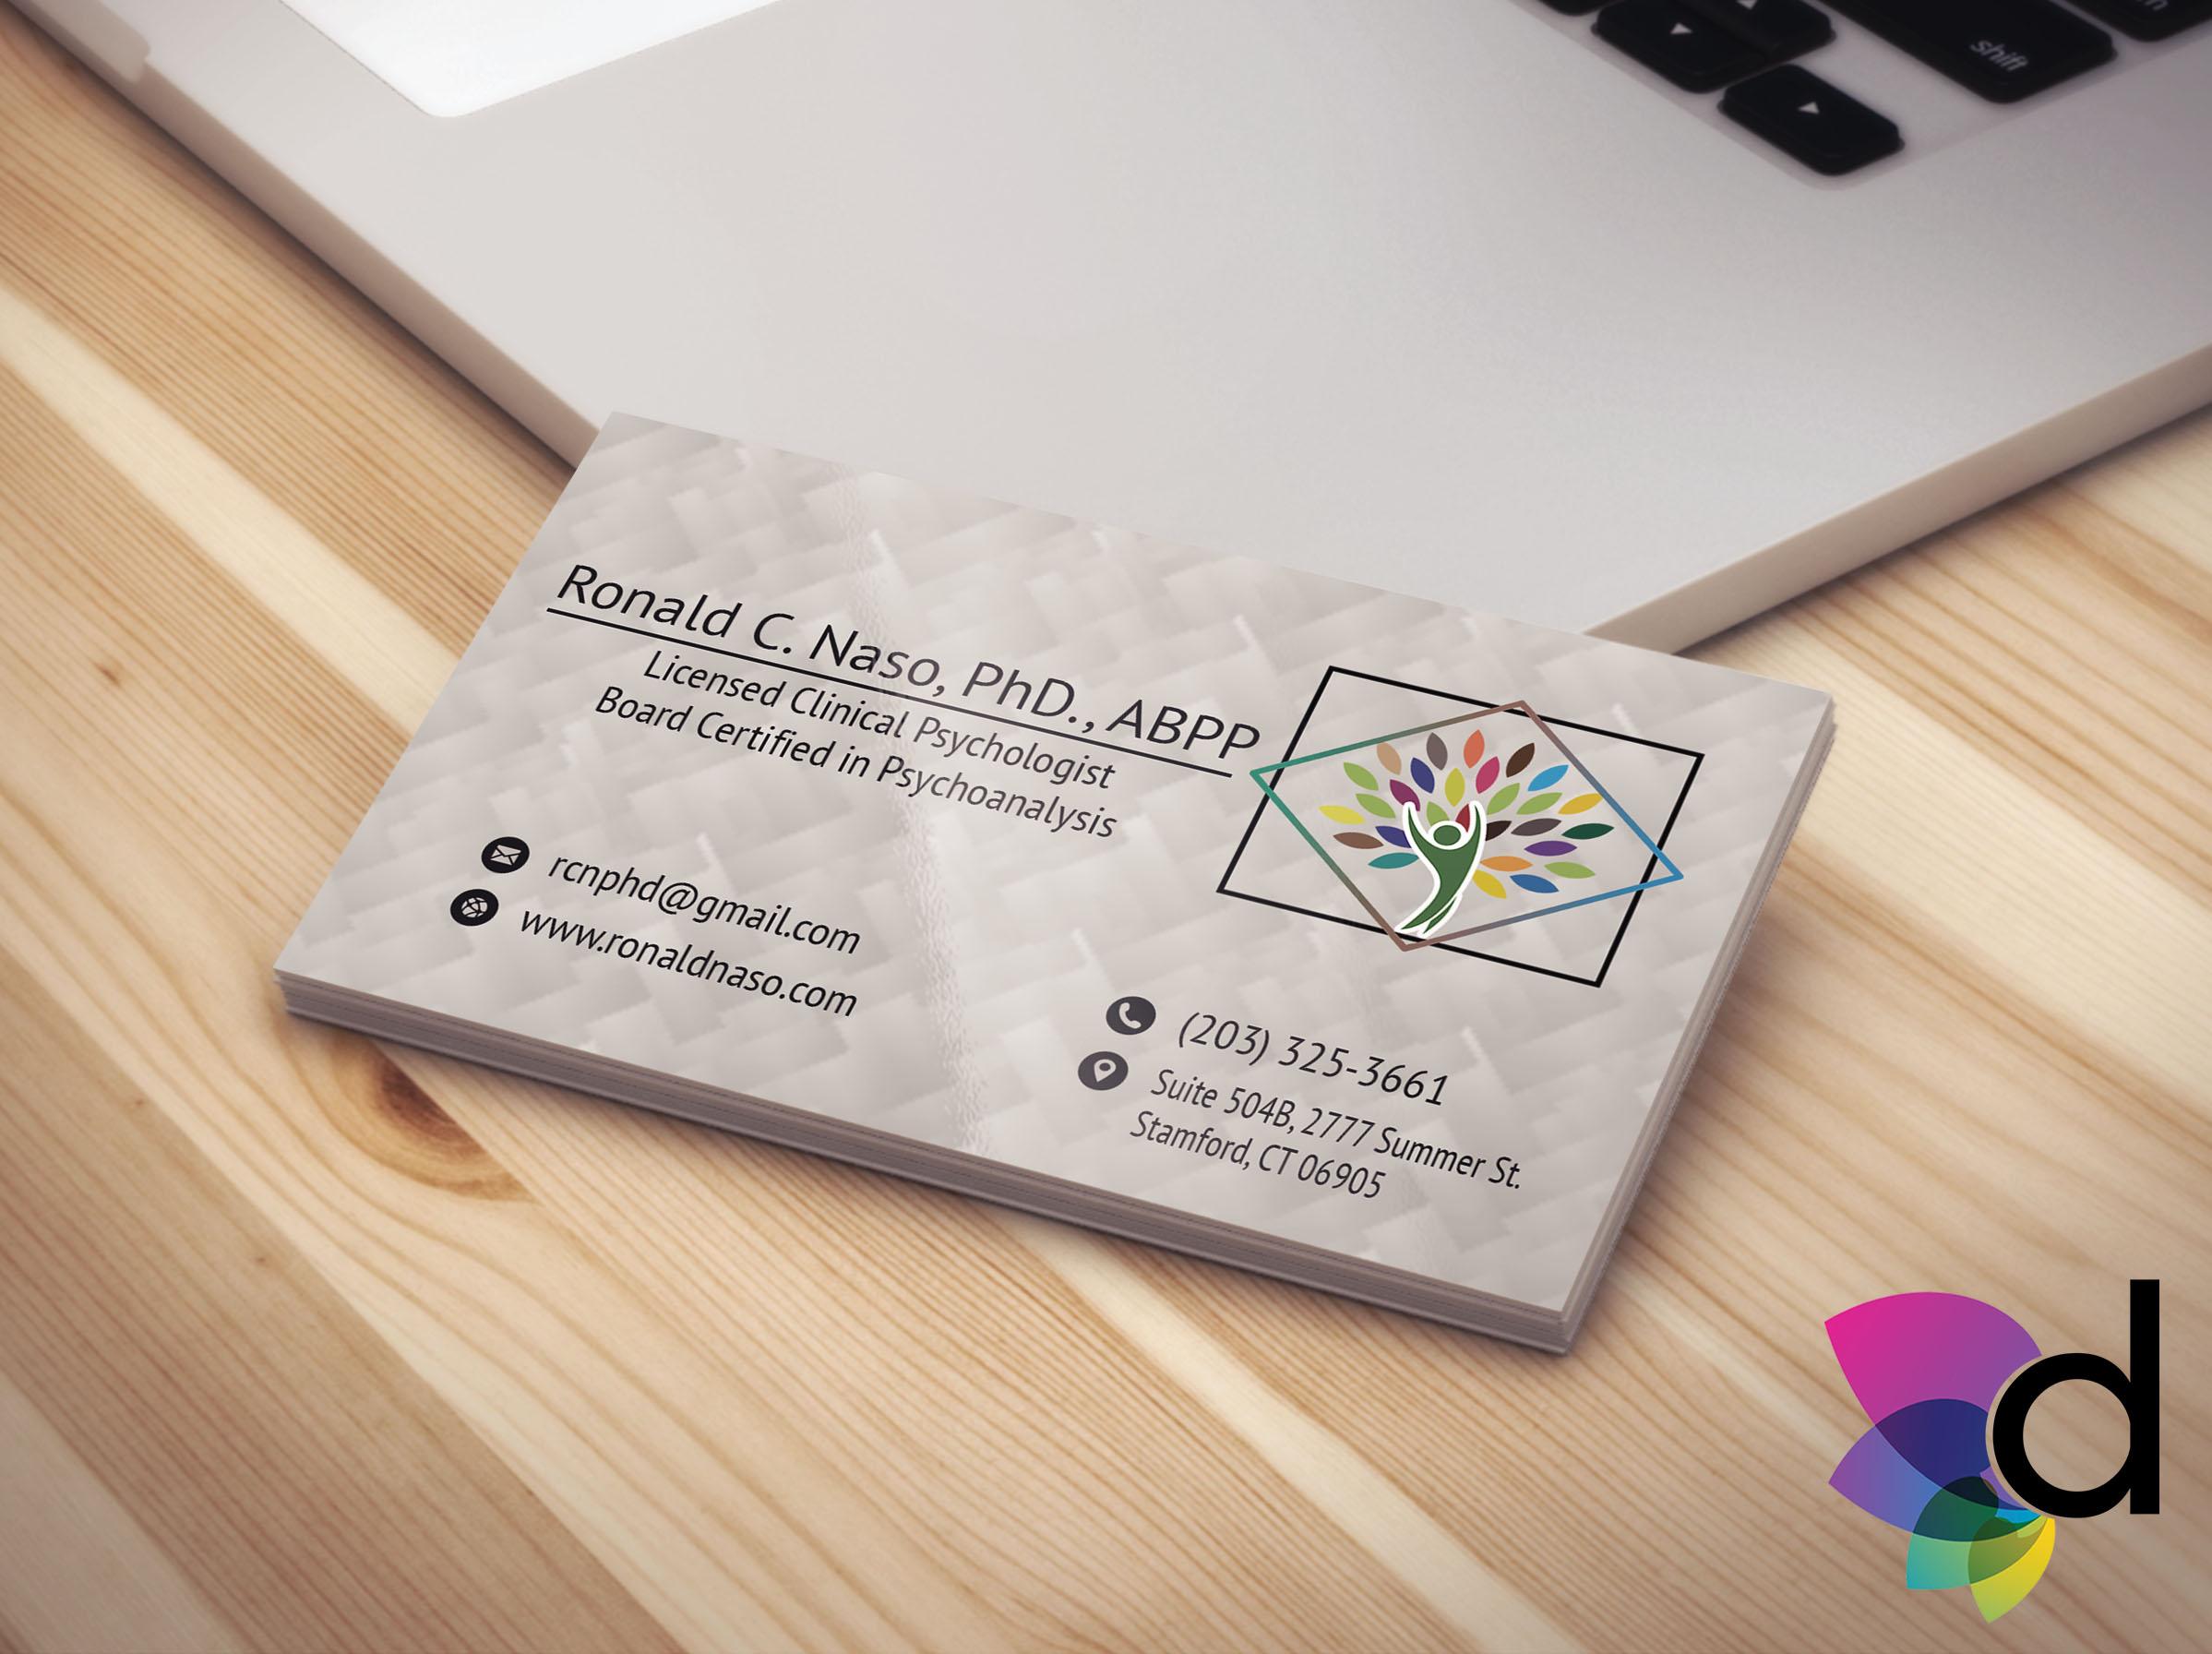 Ronald Naso Business Card.jpg